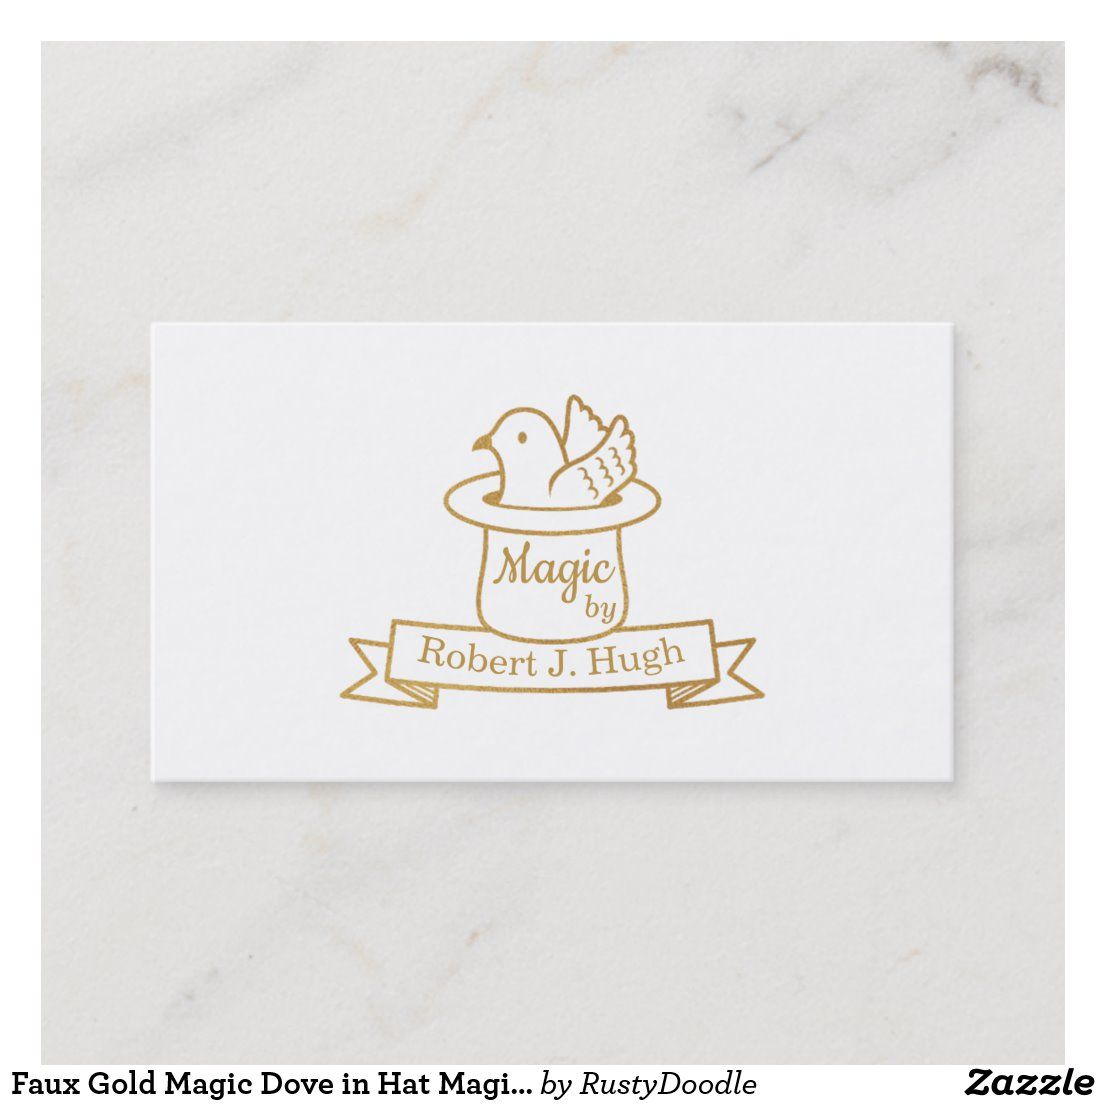 Faux Gold Magic Dove In Hat Magician Business Card Zazzle Com The Magicians Business Card Template Design Doodle Designs